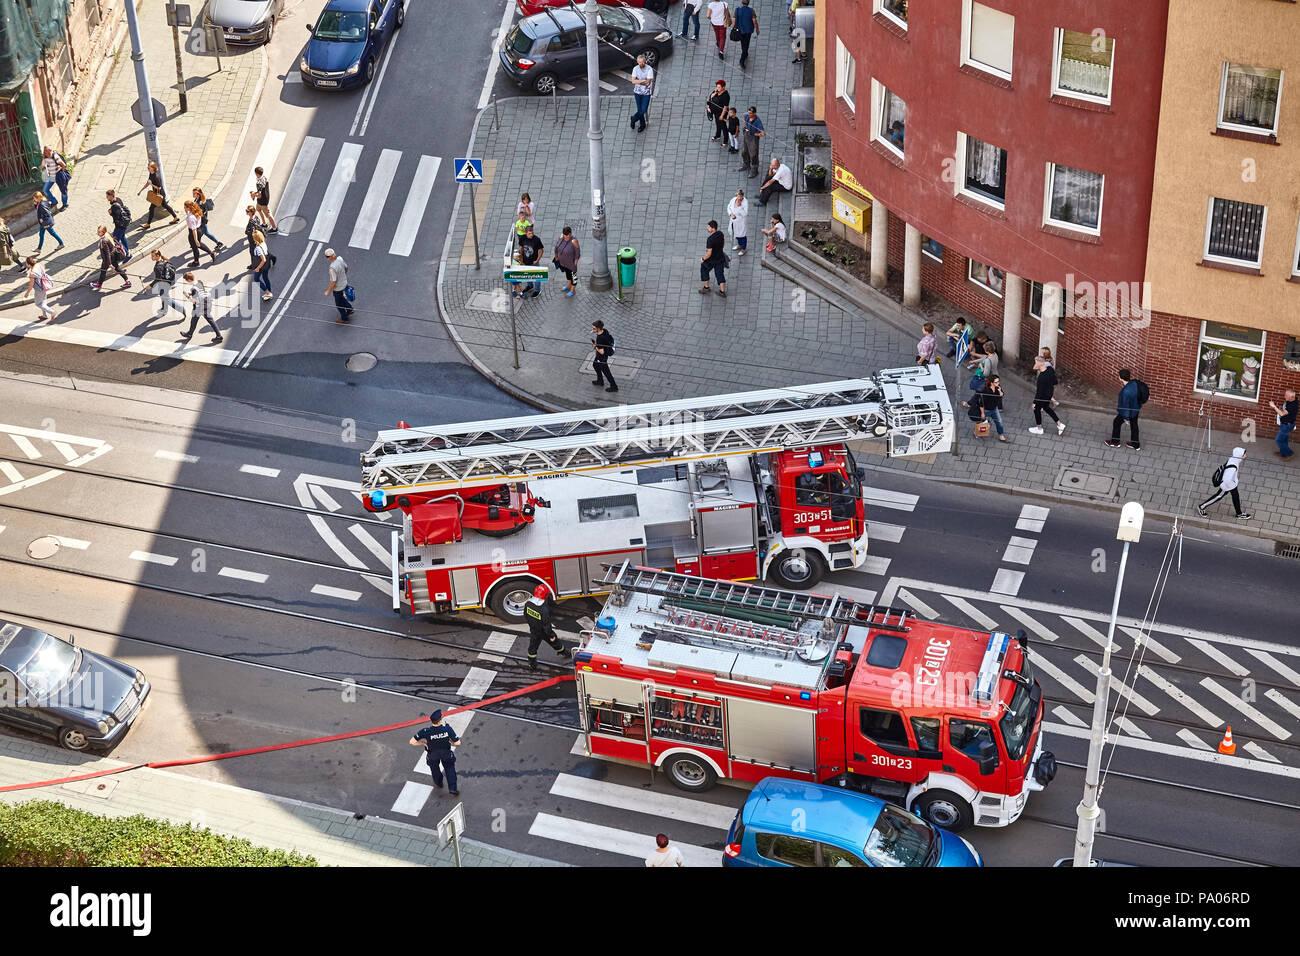 Szczecin, Poland - July 19, 2018: Fire brigade prepares to extinguish residential building fire at Niemierzynska Street. - Stock Image